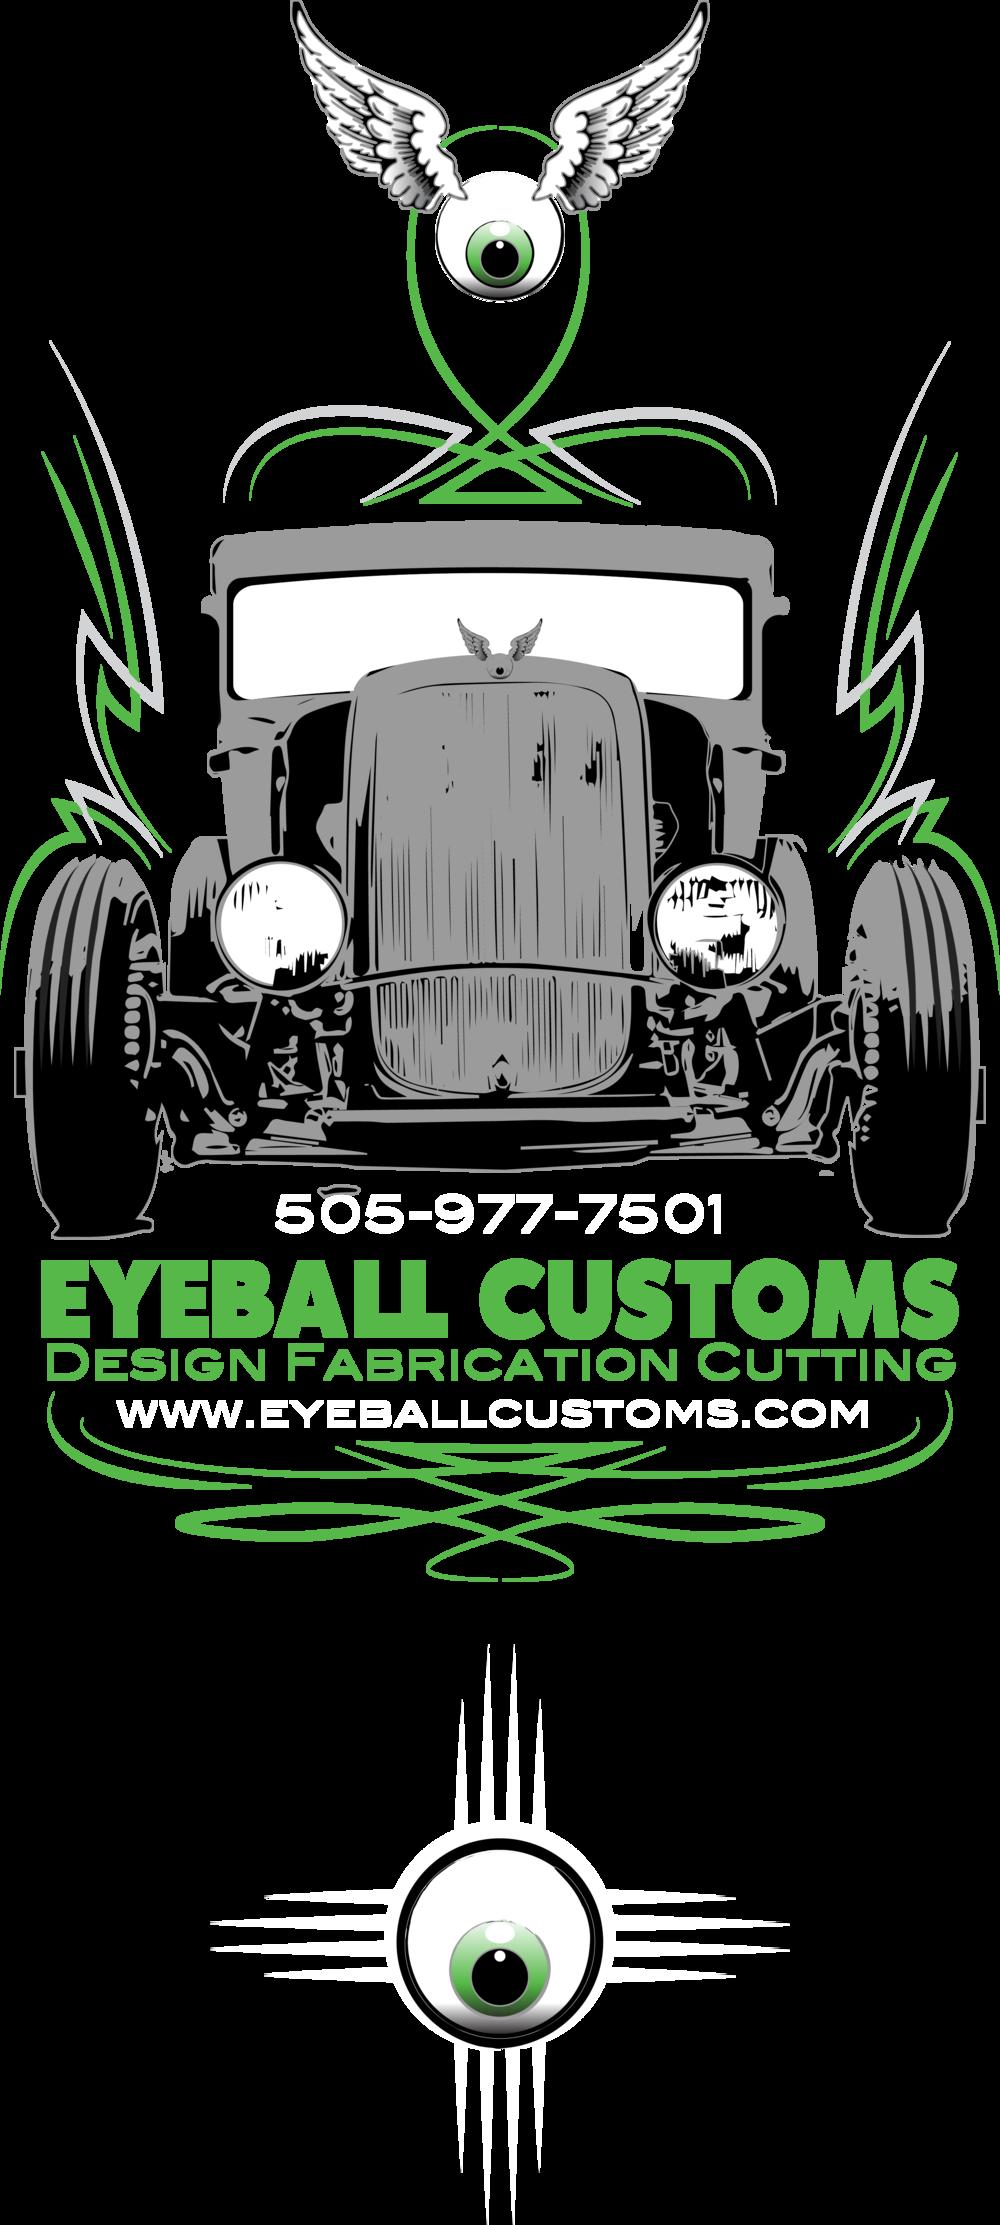 eyeball customs shirt.pdf.png